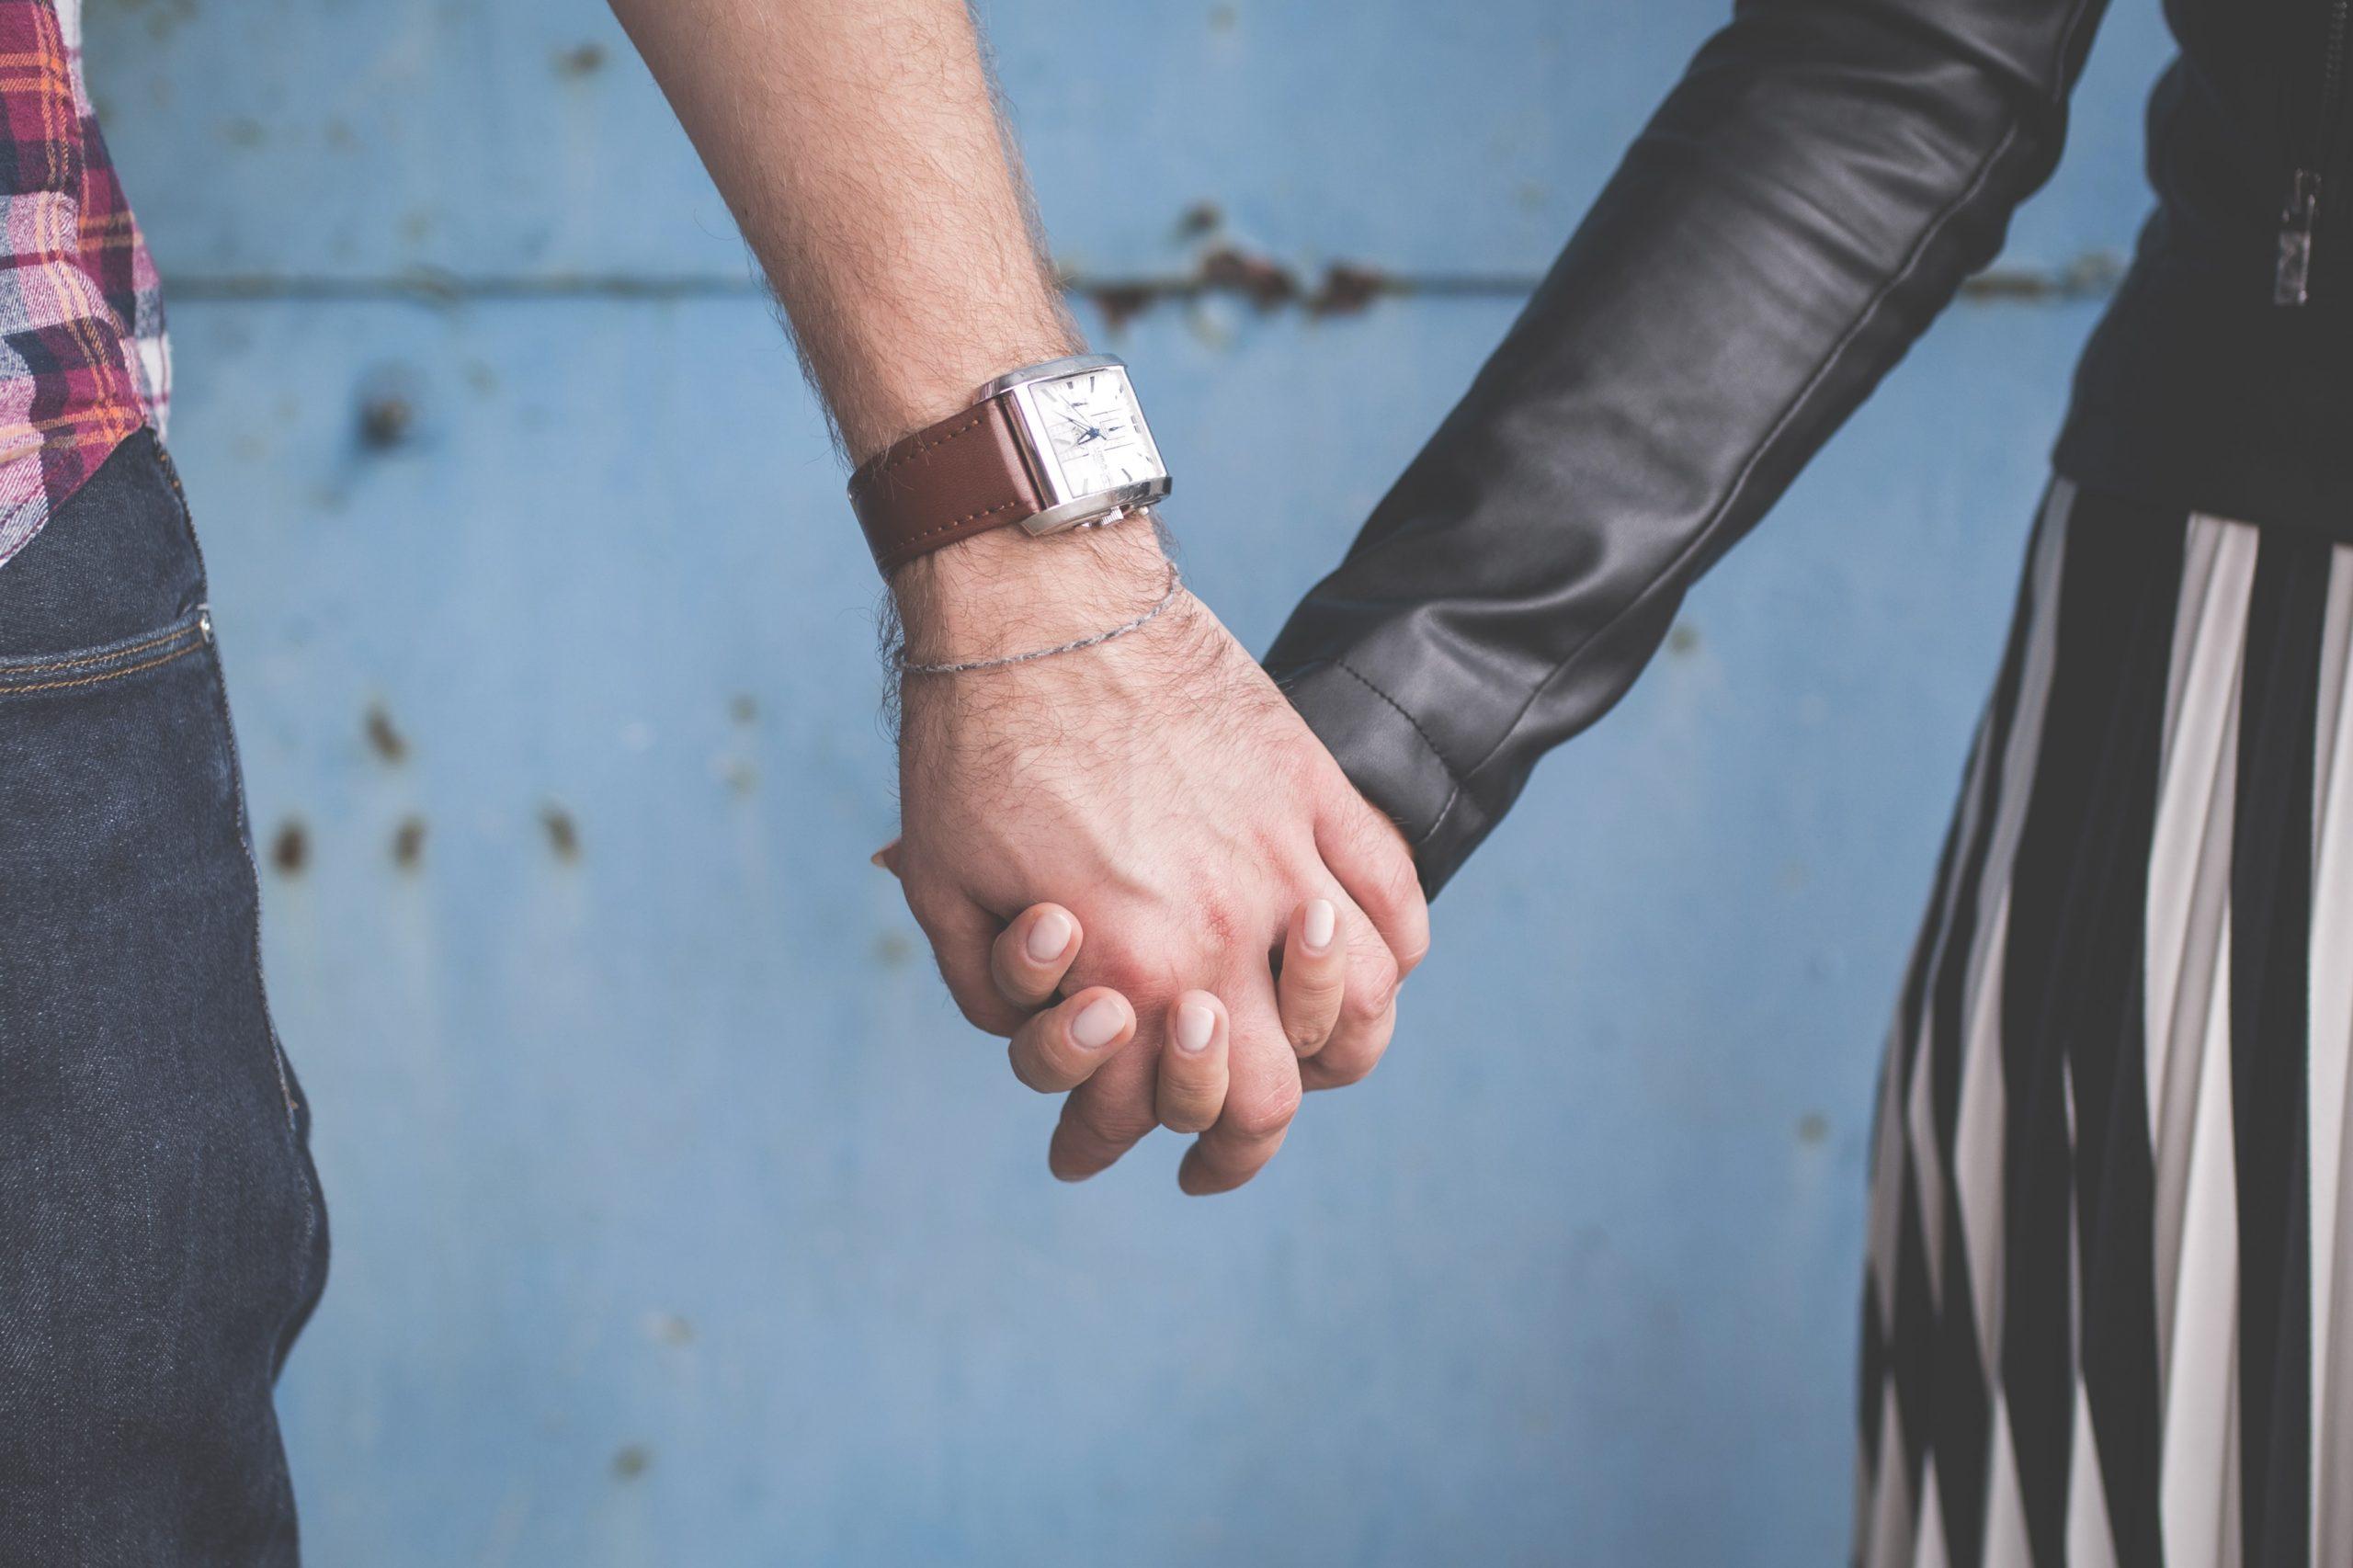 Namorar durante o intercâmbio dá certo?